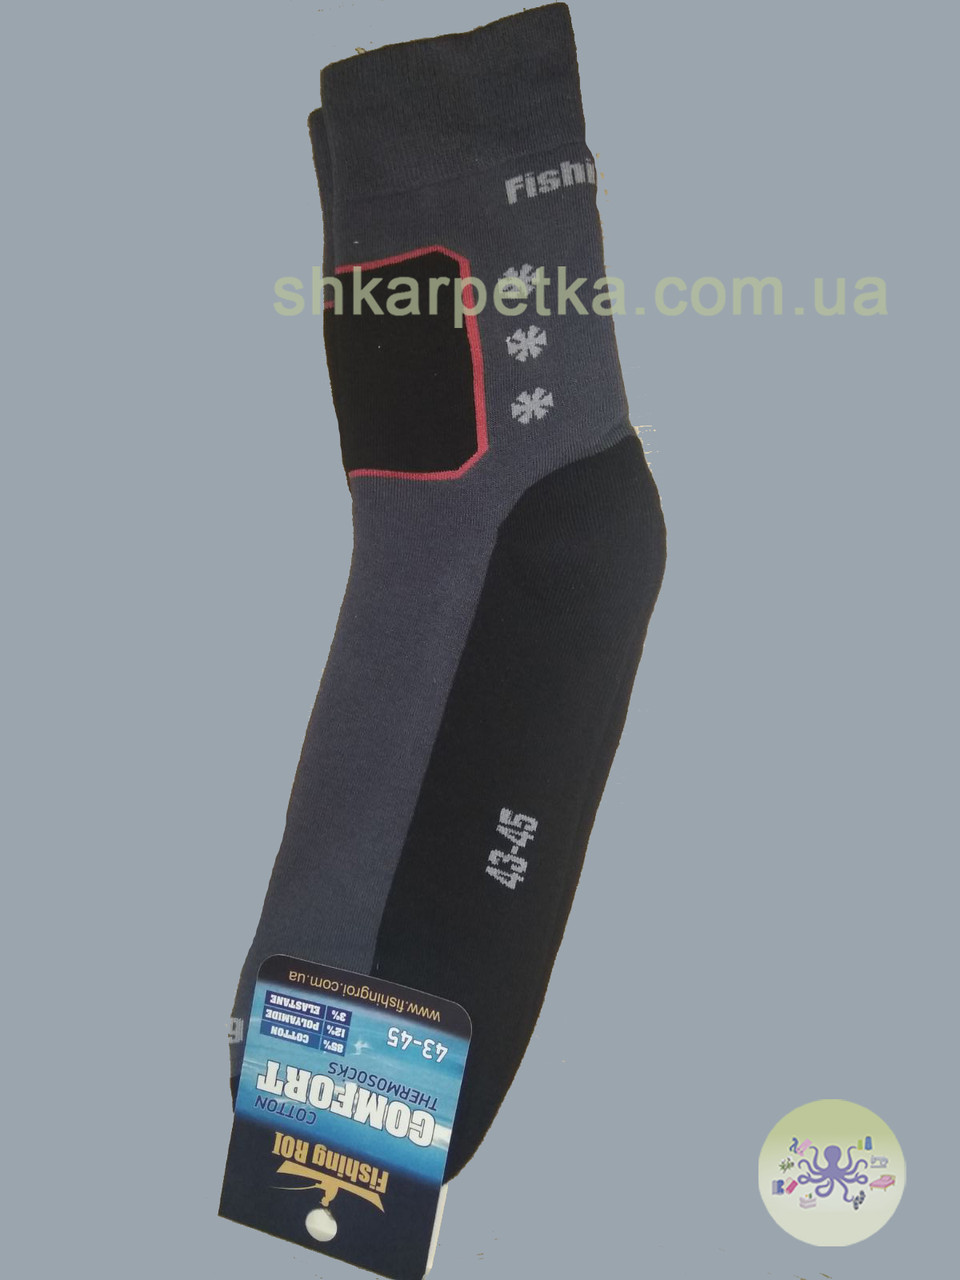 Термошкарпетки Fishing Roi